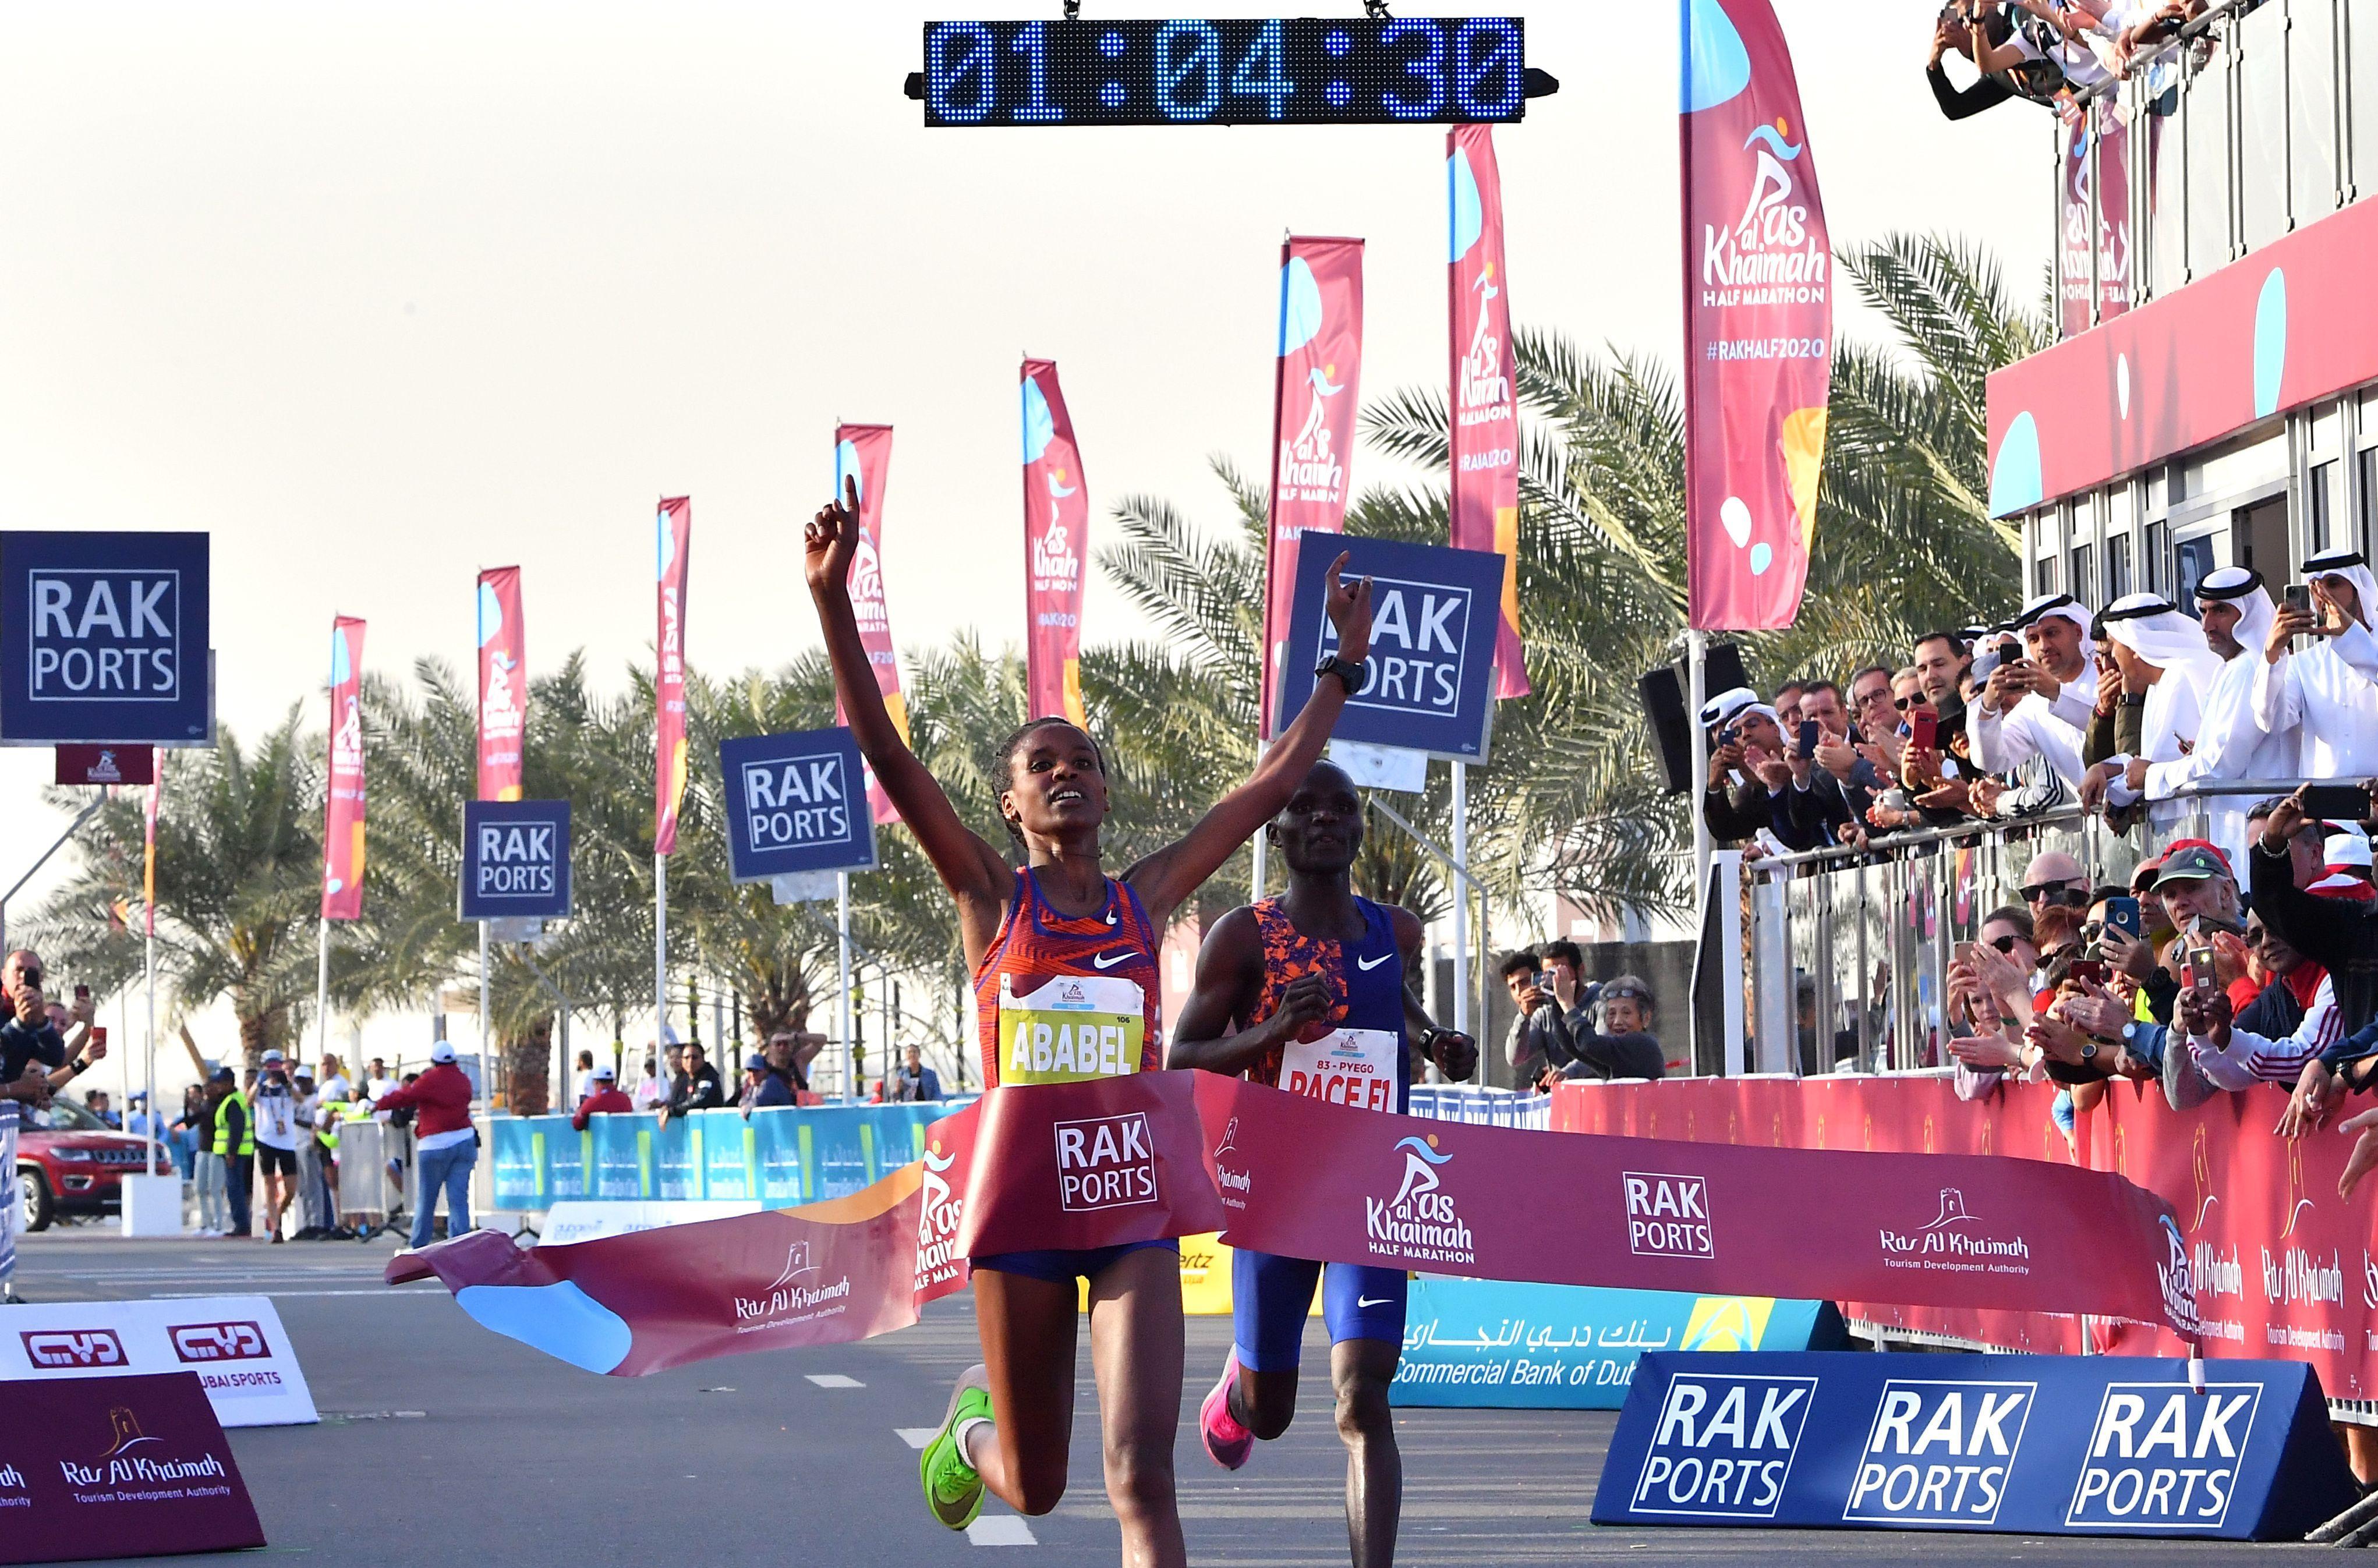 Ethiopian runner smashes half-marathon record in Nike's Vaprofly sneakers - Axios